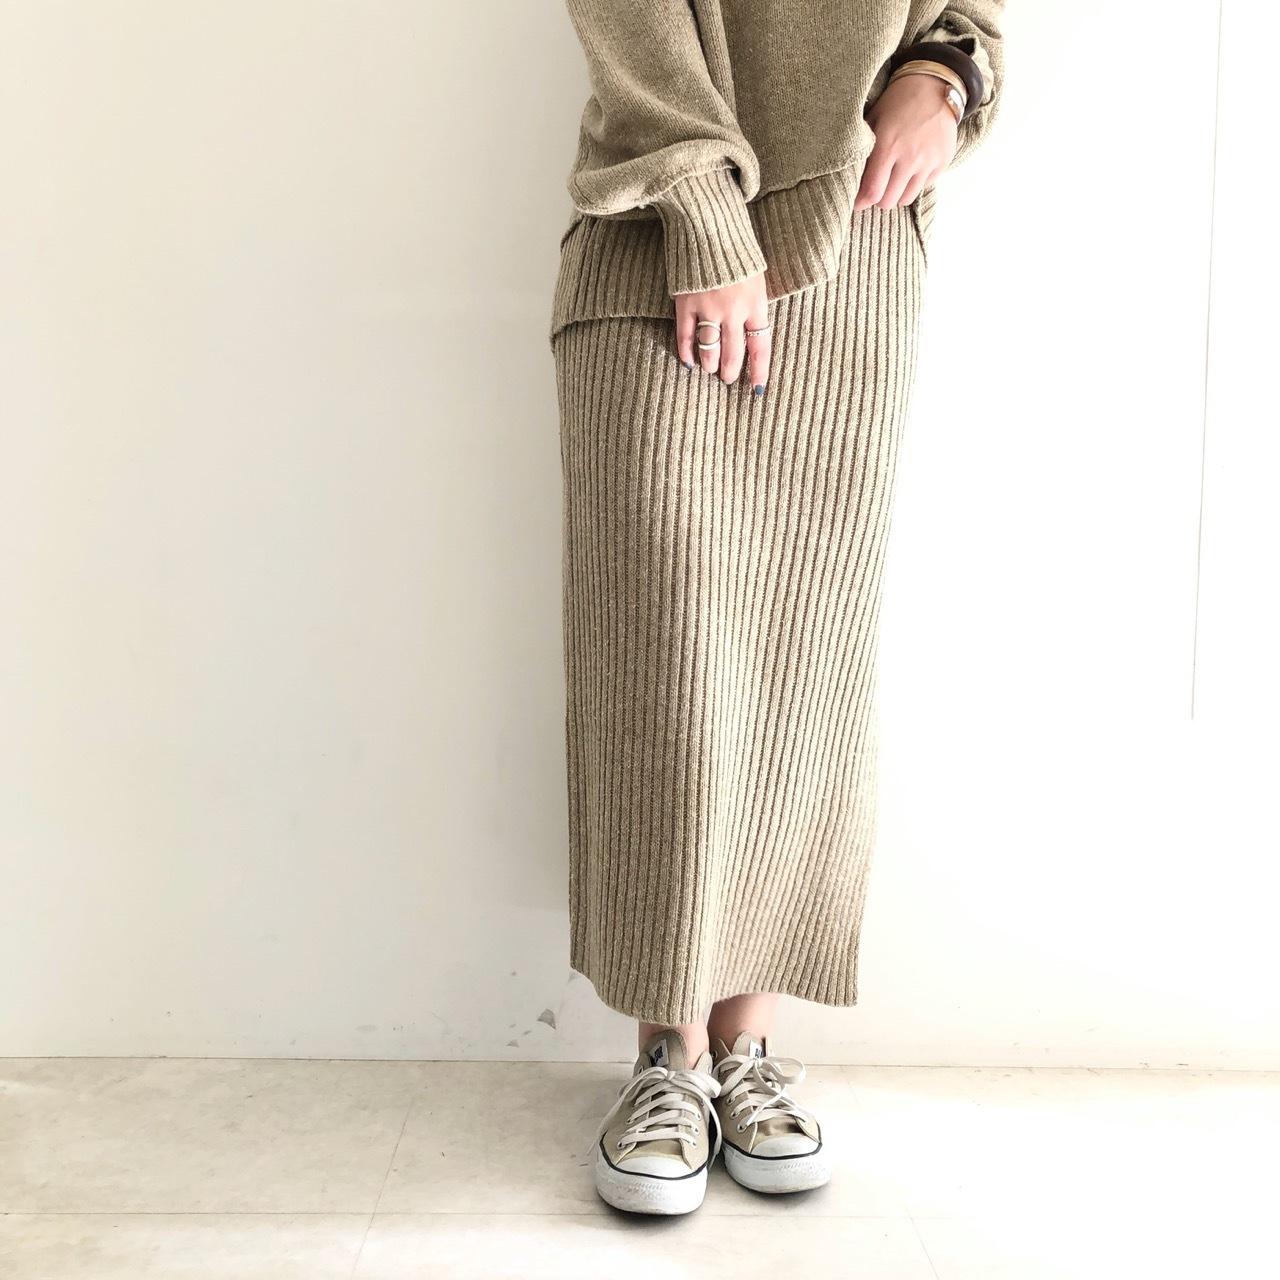 【 Framingo firm 】 リブニットタイトスカート